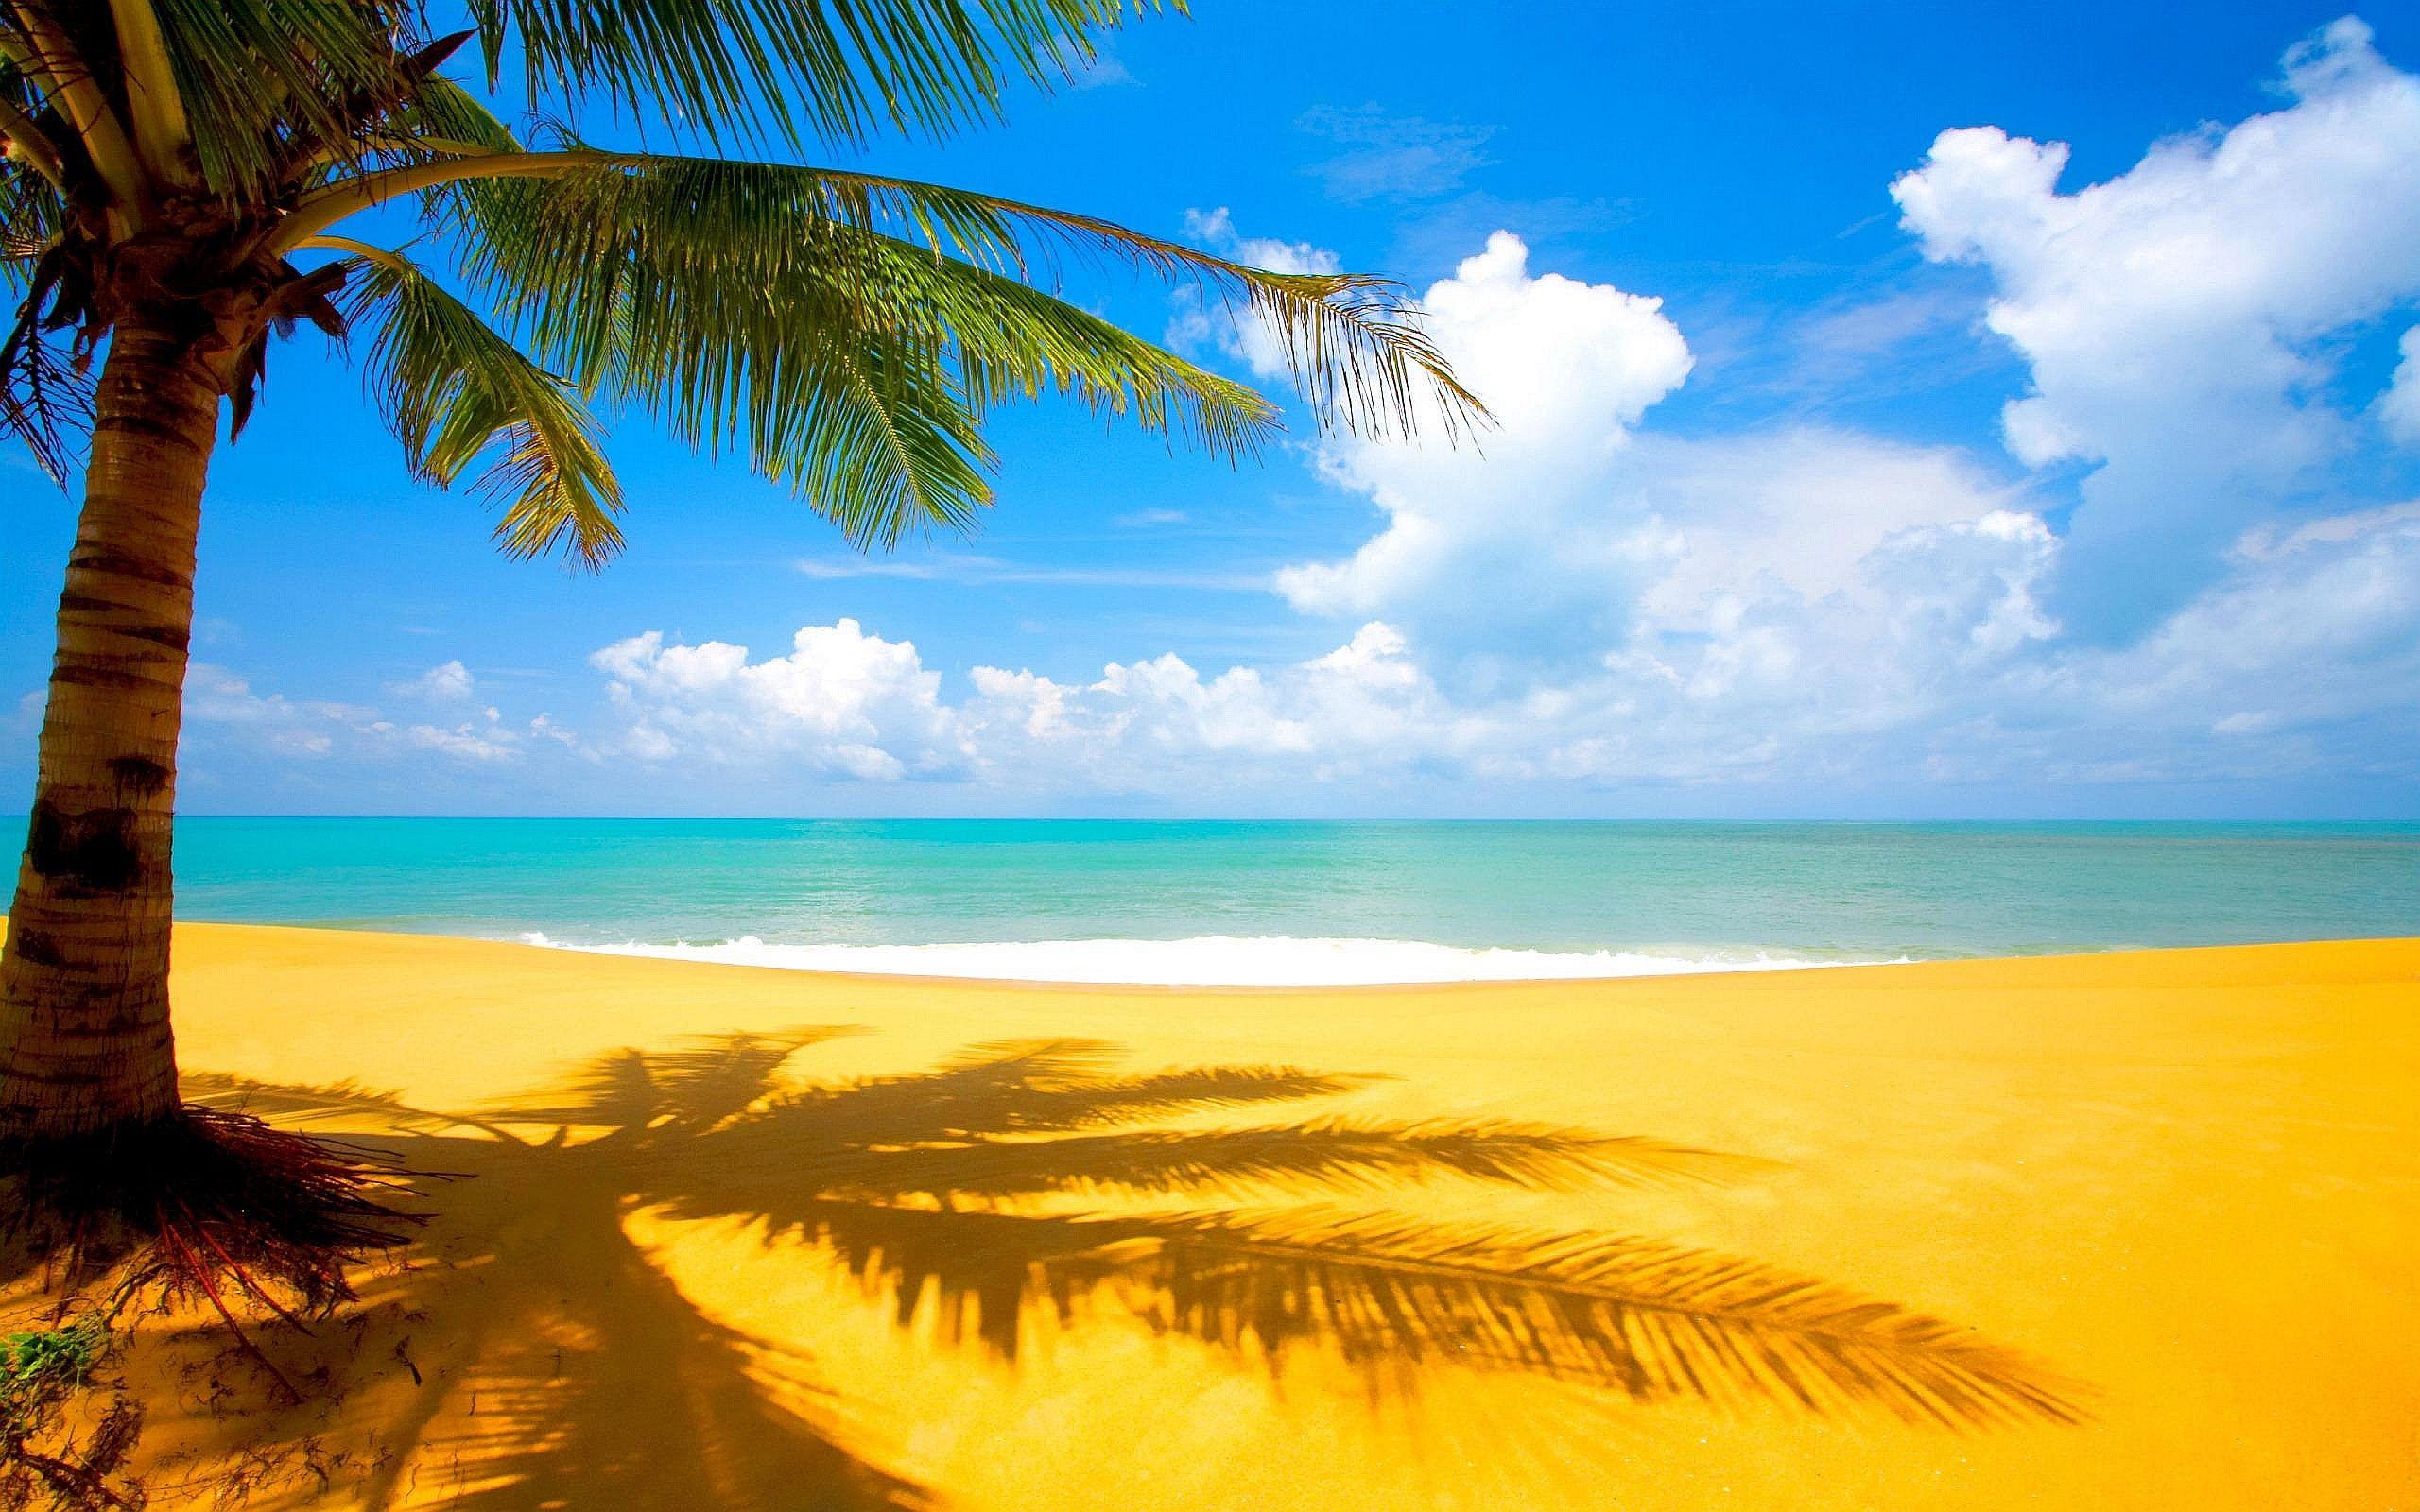 Beach Hd Desktop Wallpaper Picvenue Hd Wallpapers Wallpaper Pantai Di Pantai Pantai Tropis